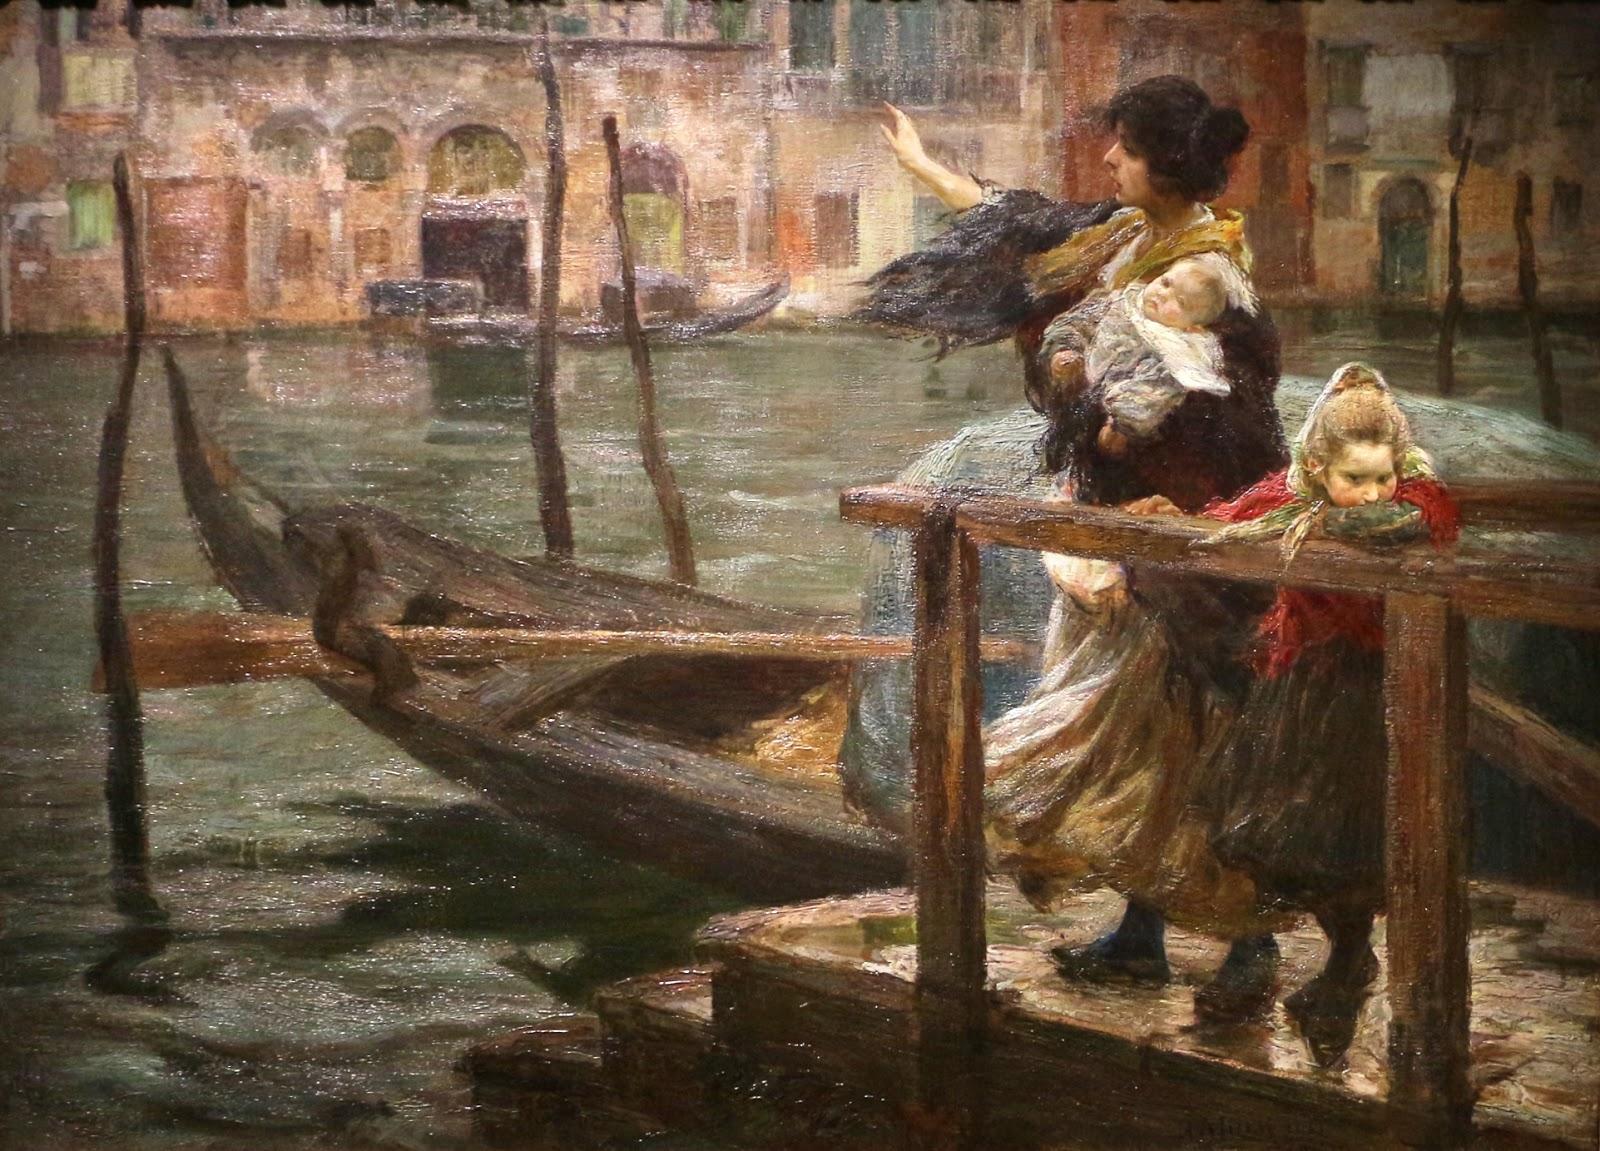 Alessandro Milesi La traversata la partenza del marinaio